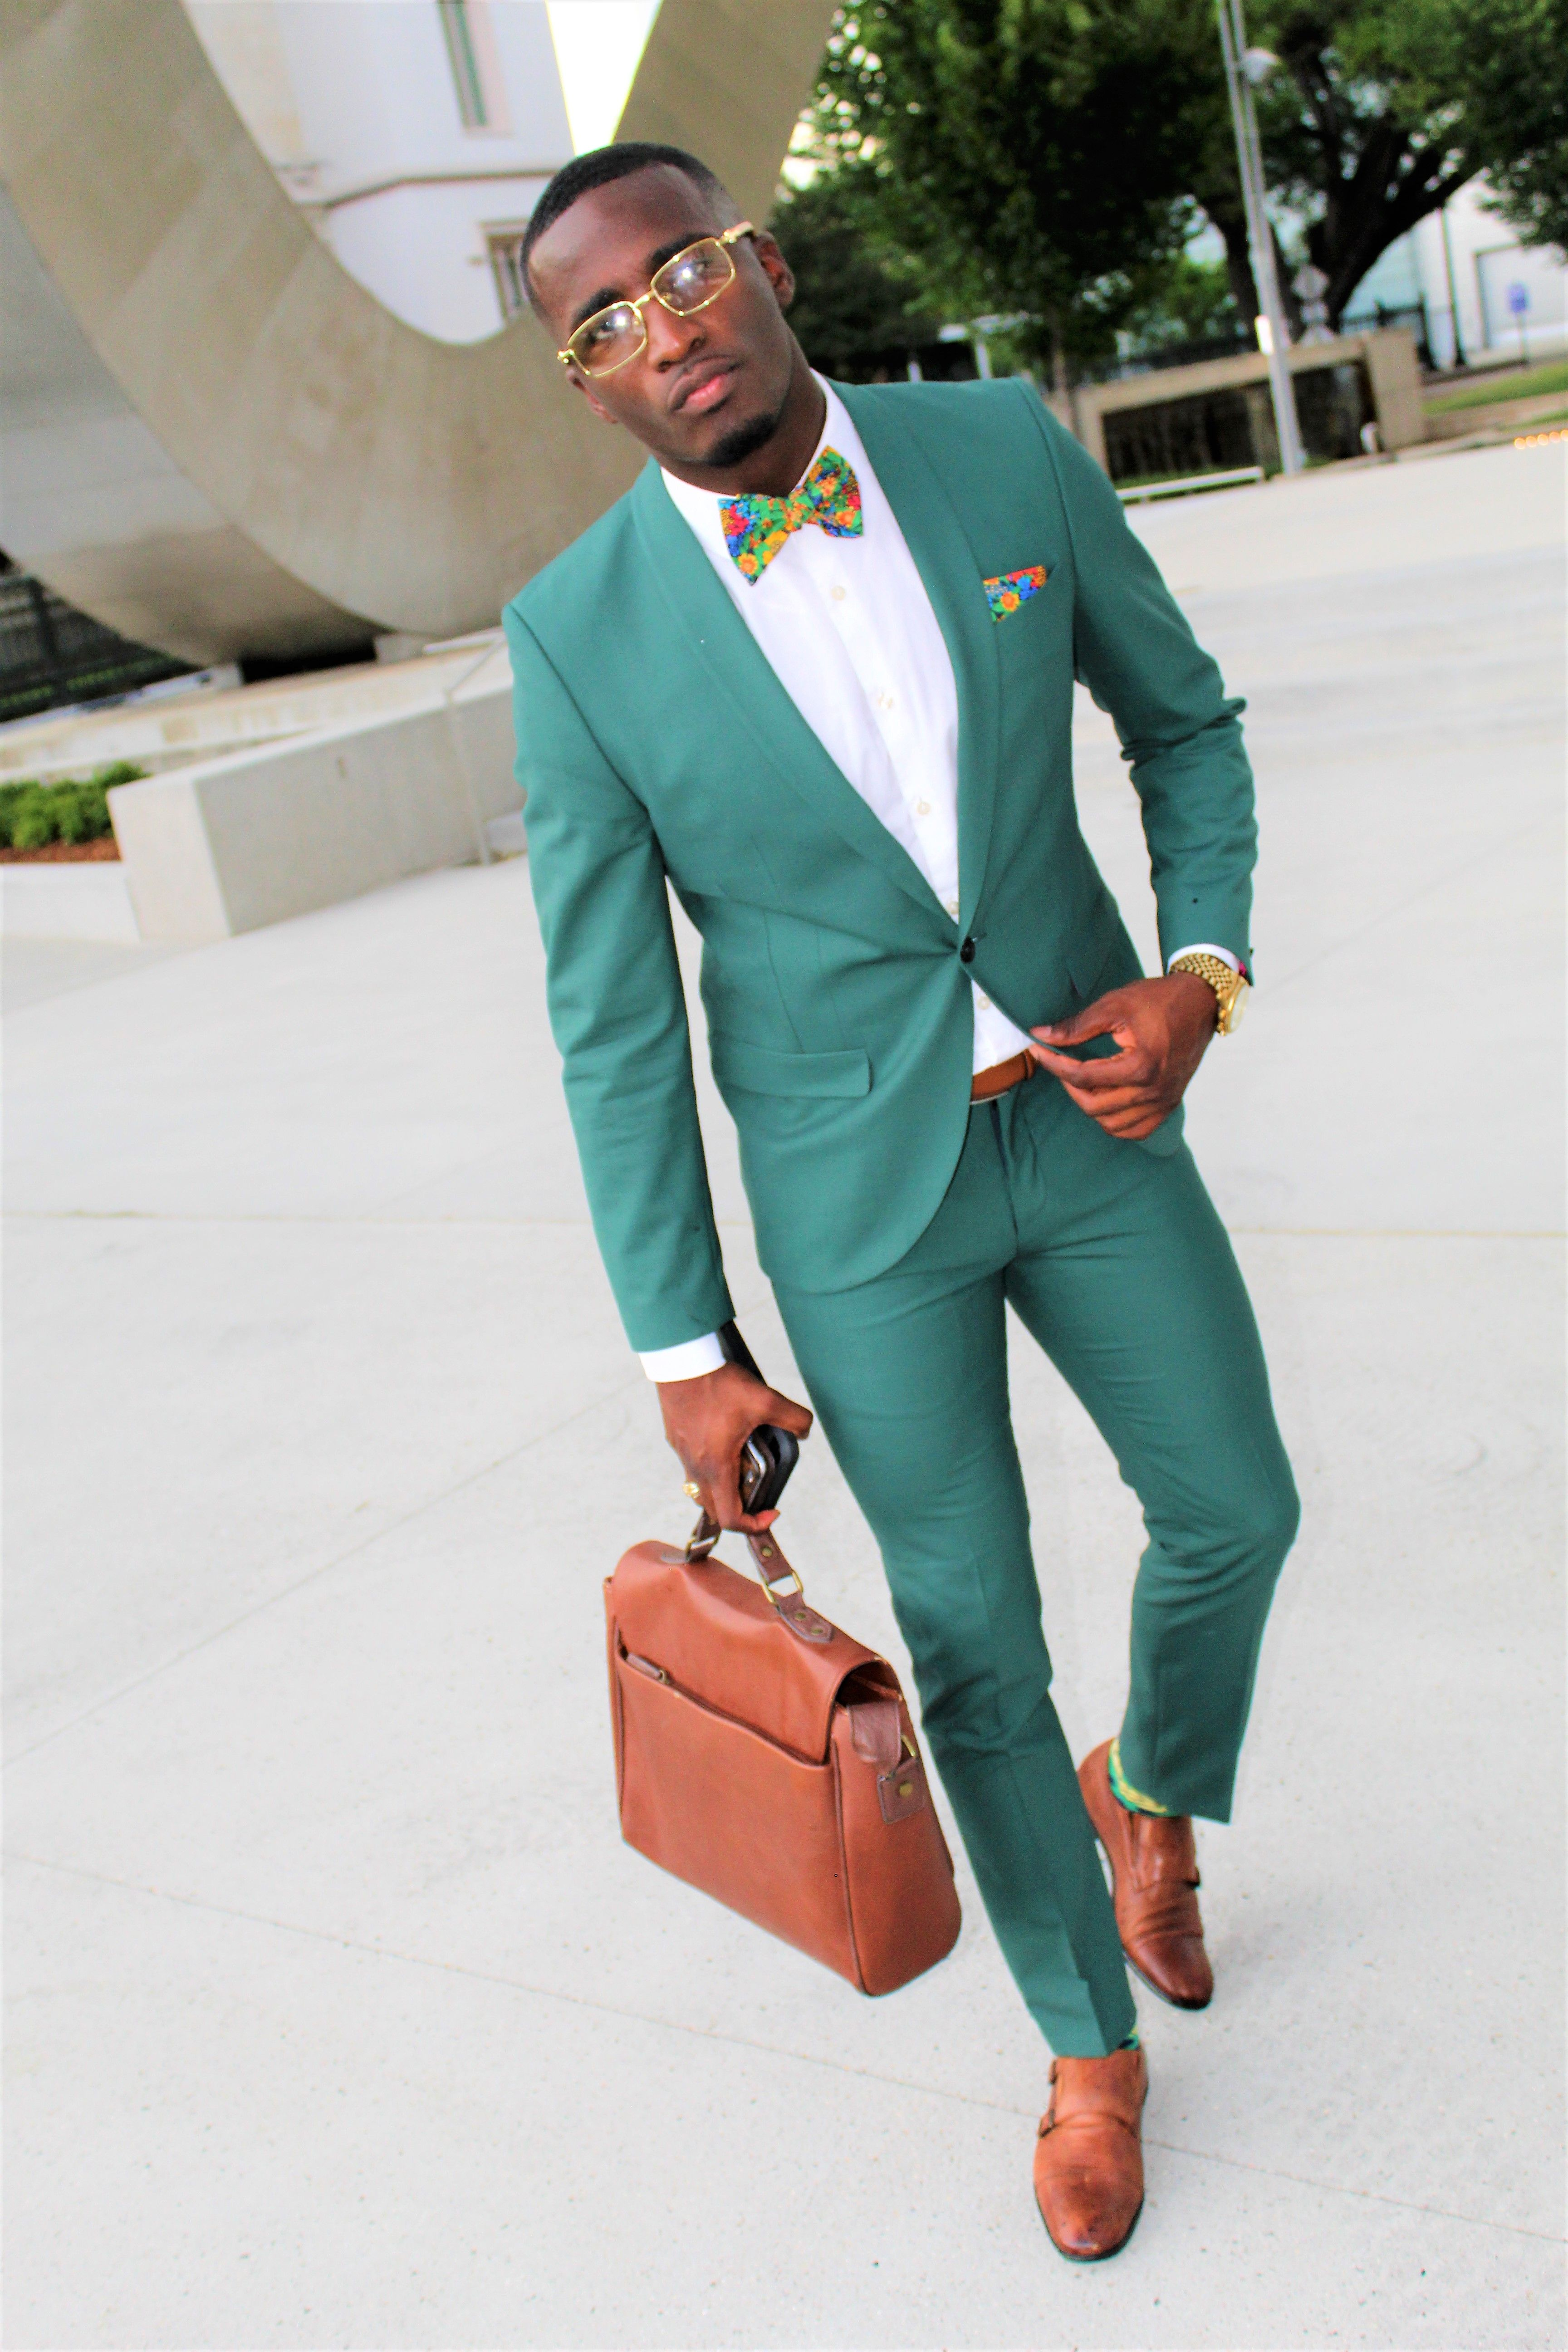 Fashion Fresh Mens Cotton  Flowers Bows Bowtie Wedding Party Adjustable Bow tie